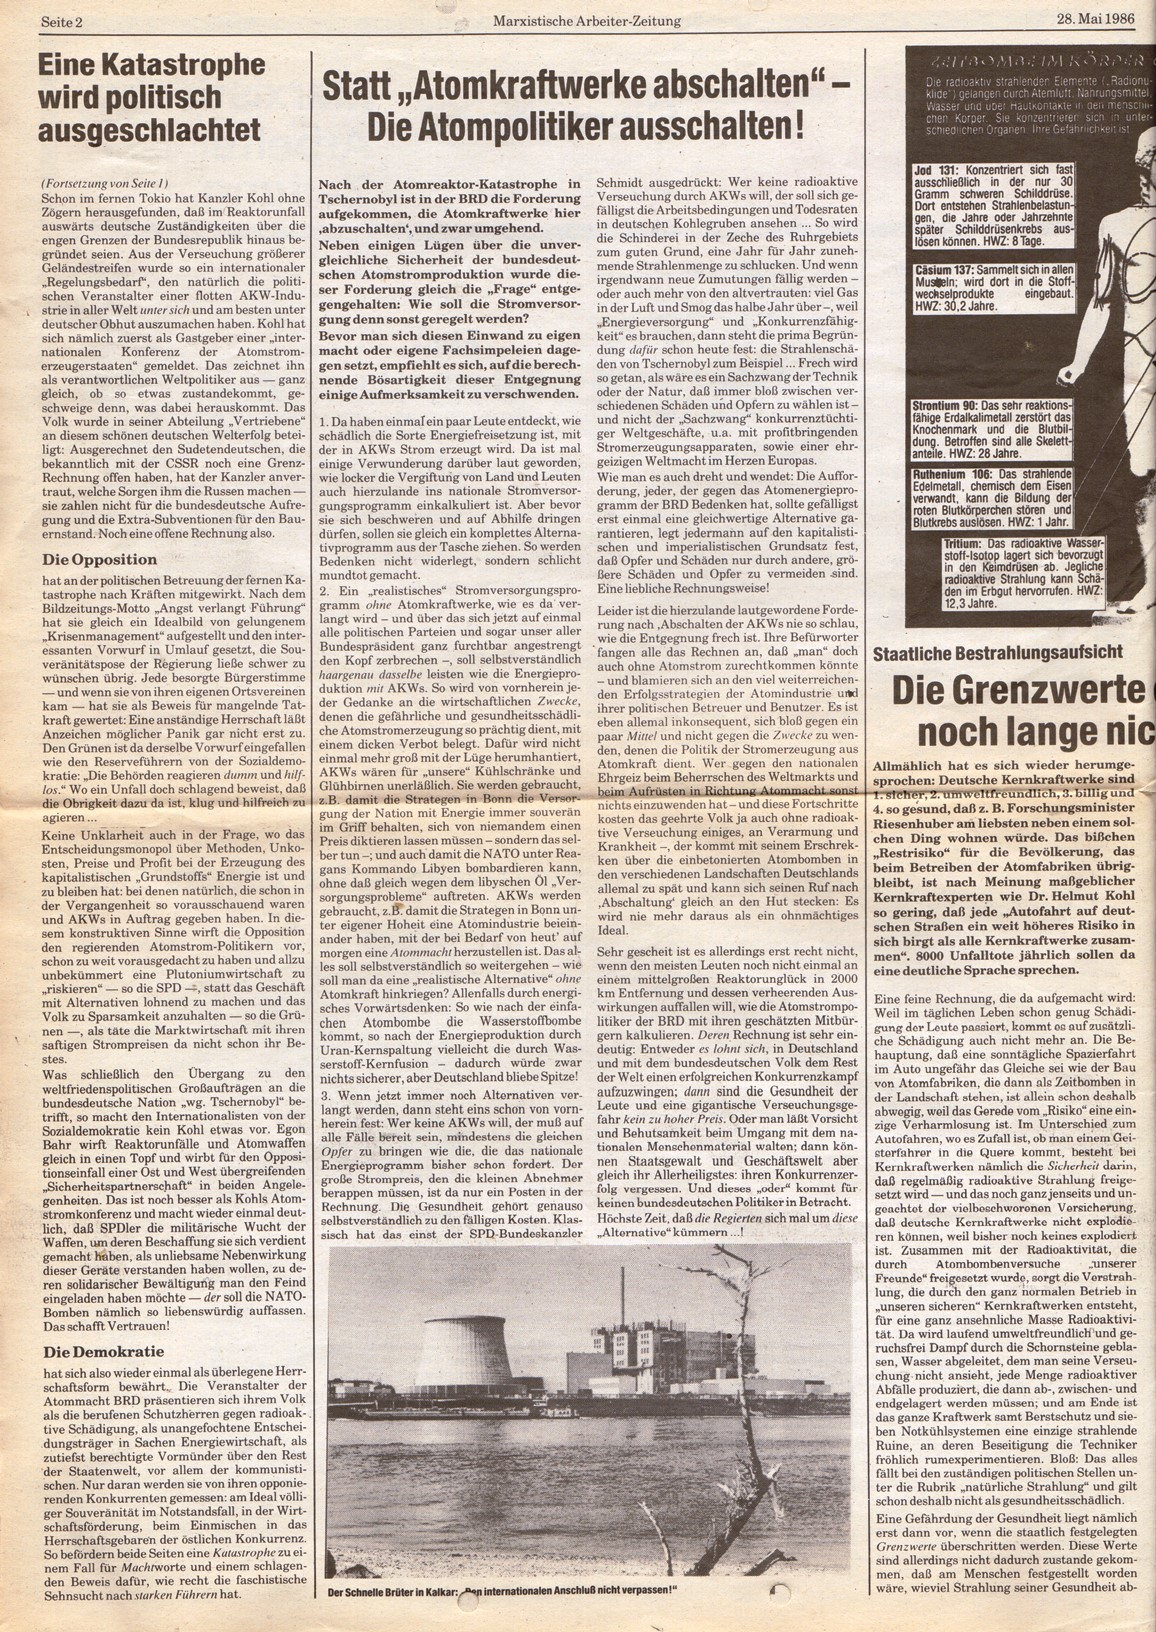 Muenchen_MG_MAZ_Siemens_19860528_02